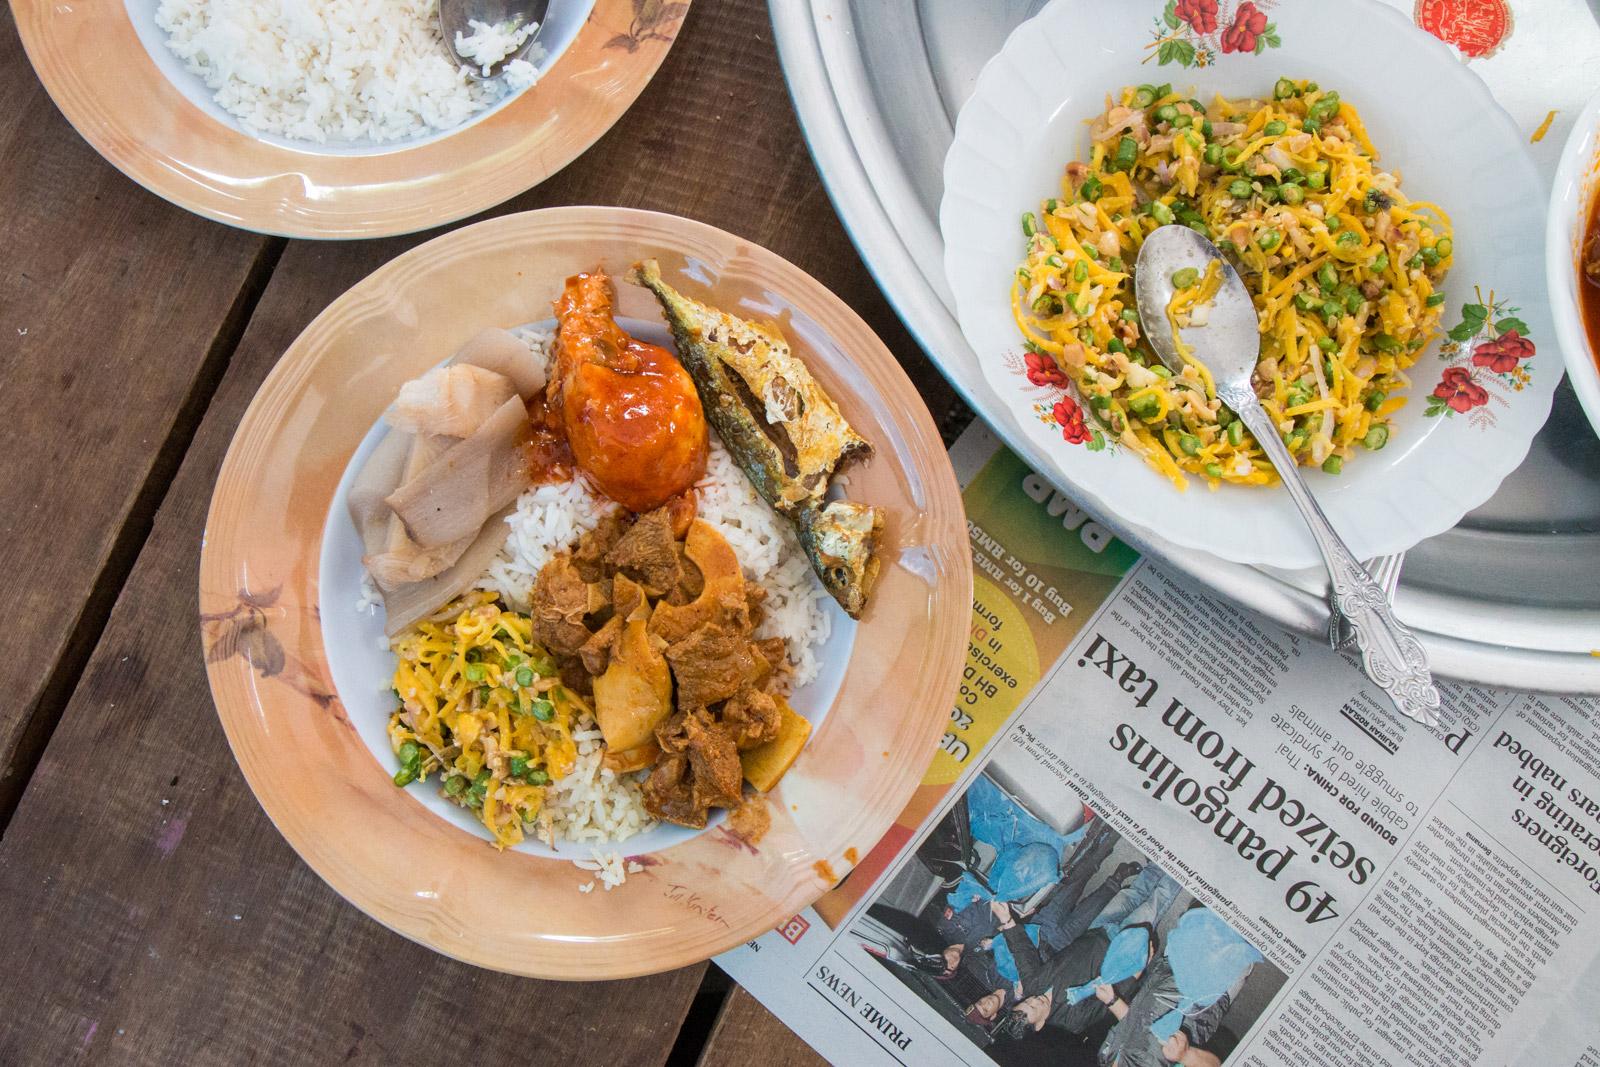 Crashing a malaysian wedding food and a surprise durian malaysian wedding food junglespirit Gallery